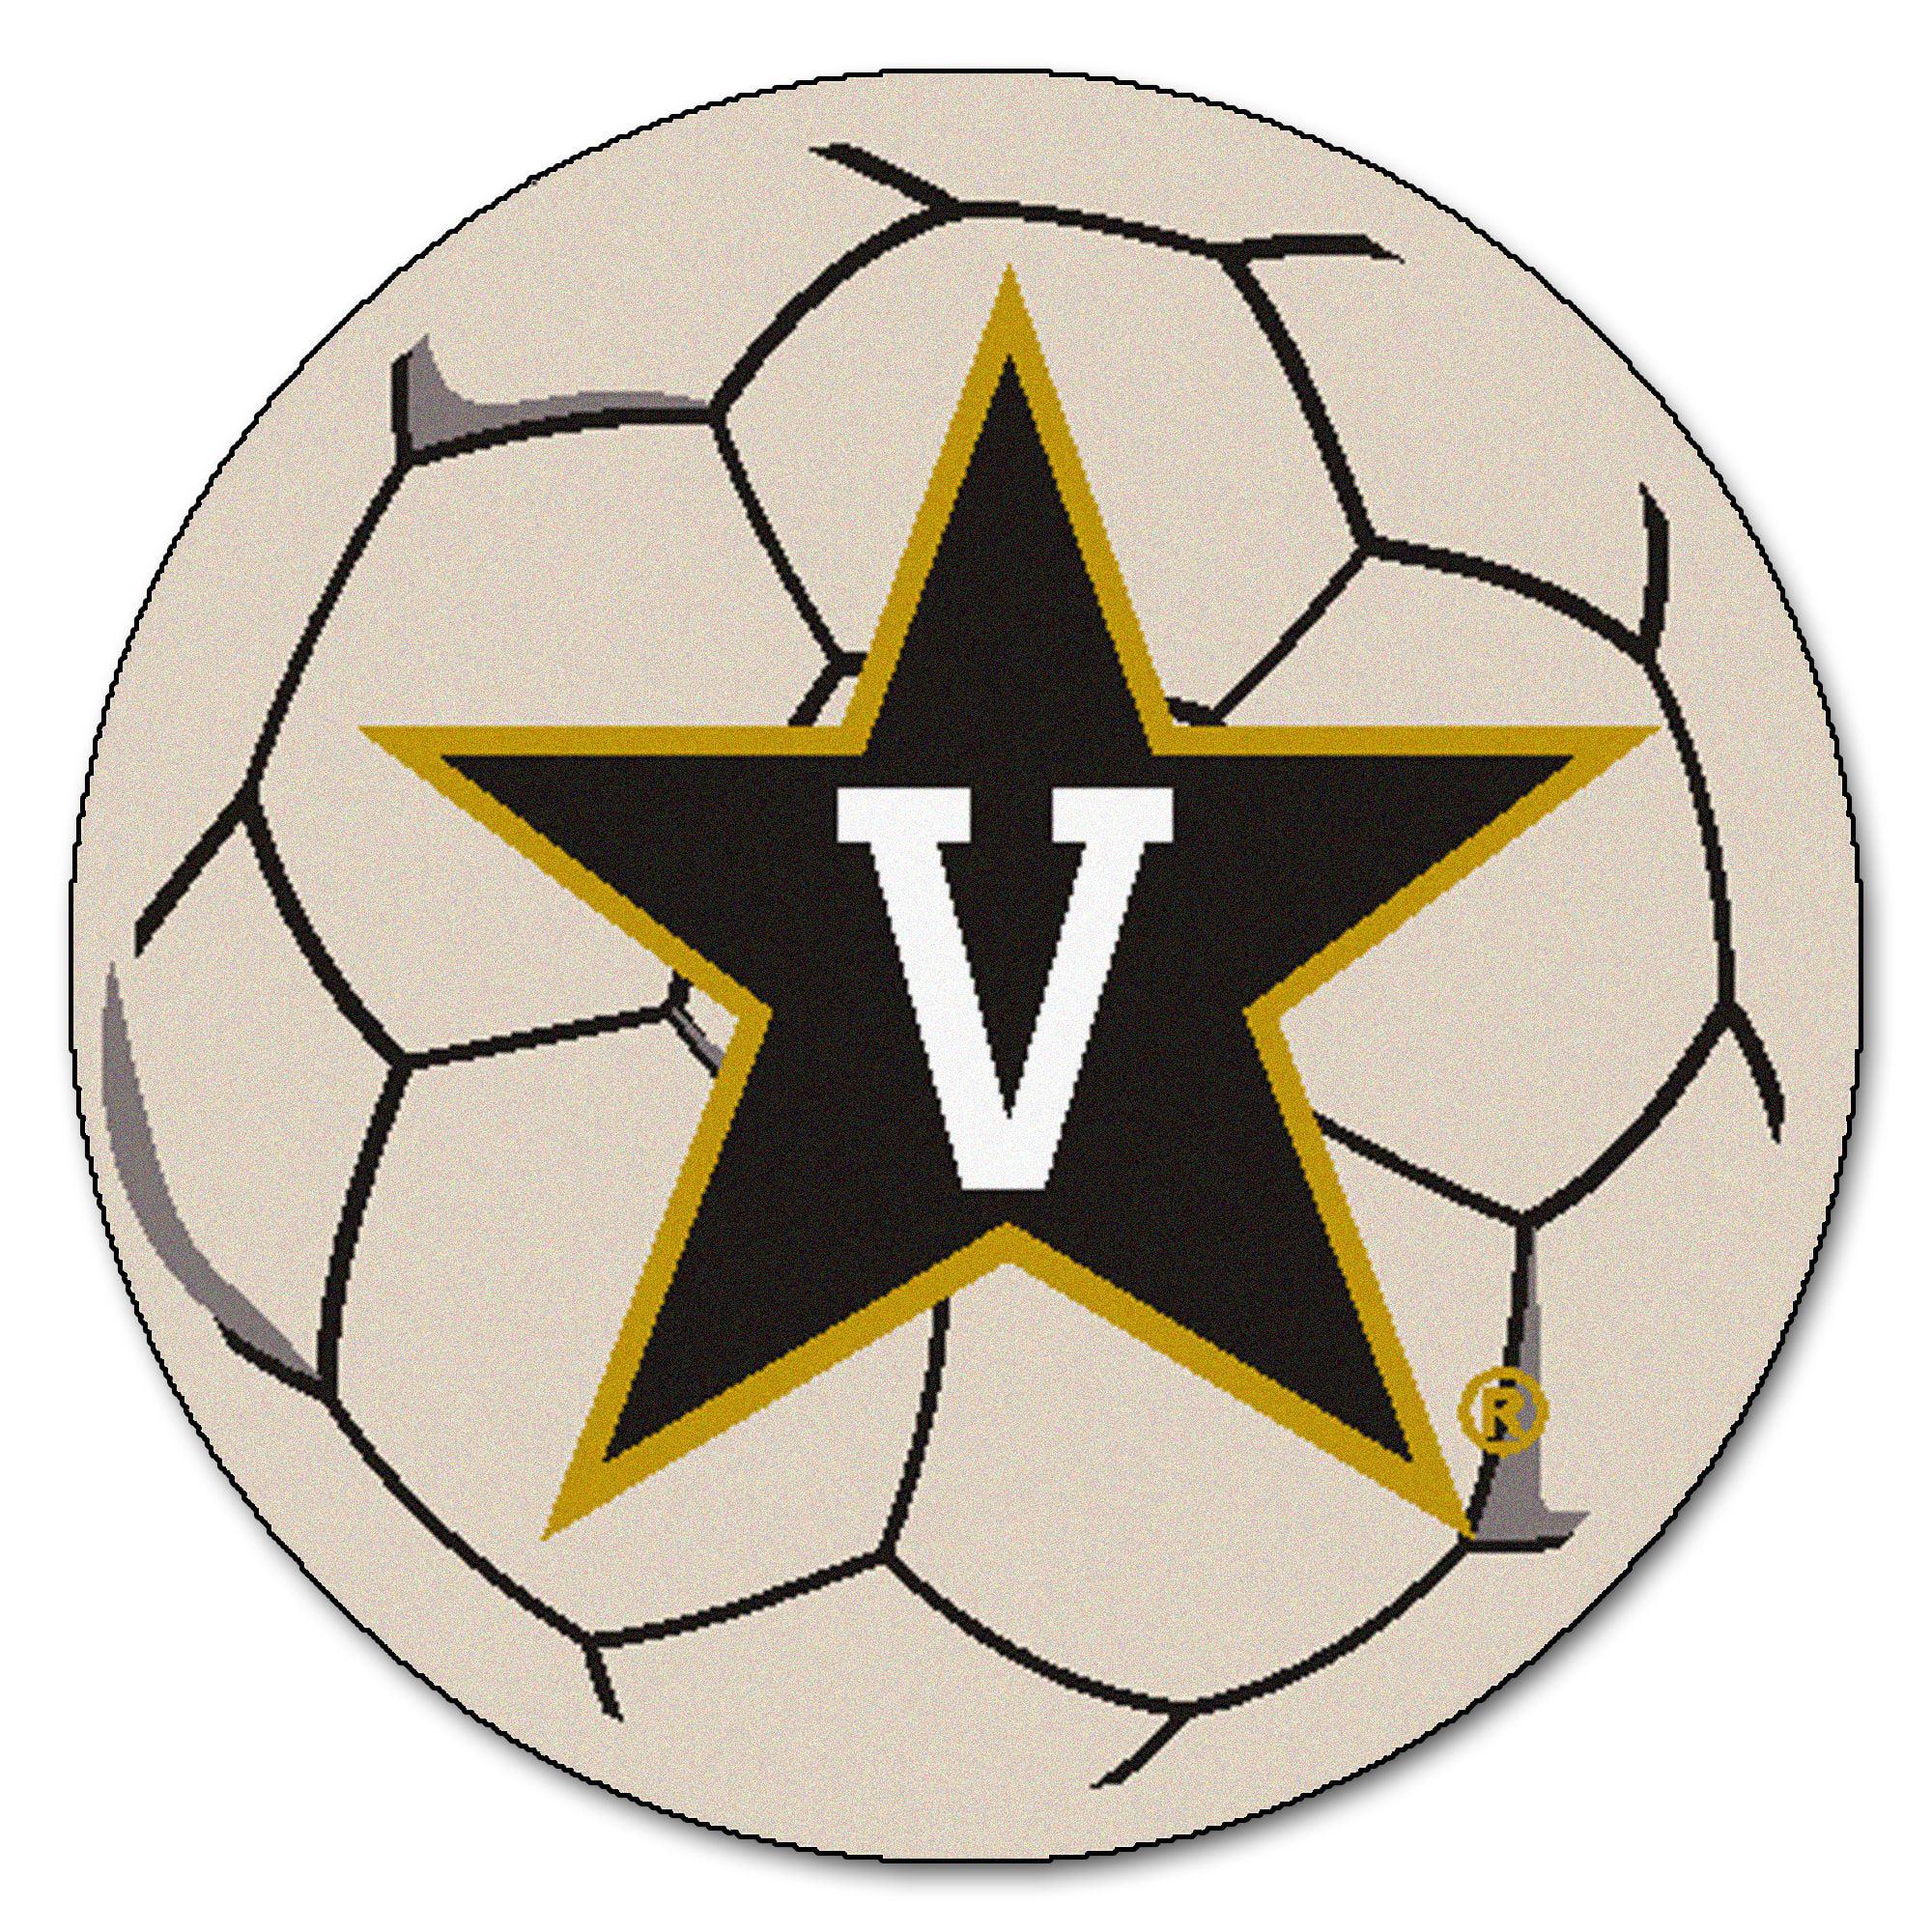 "Vanderbilt Soccer Ball 27"" diameter"